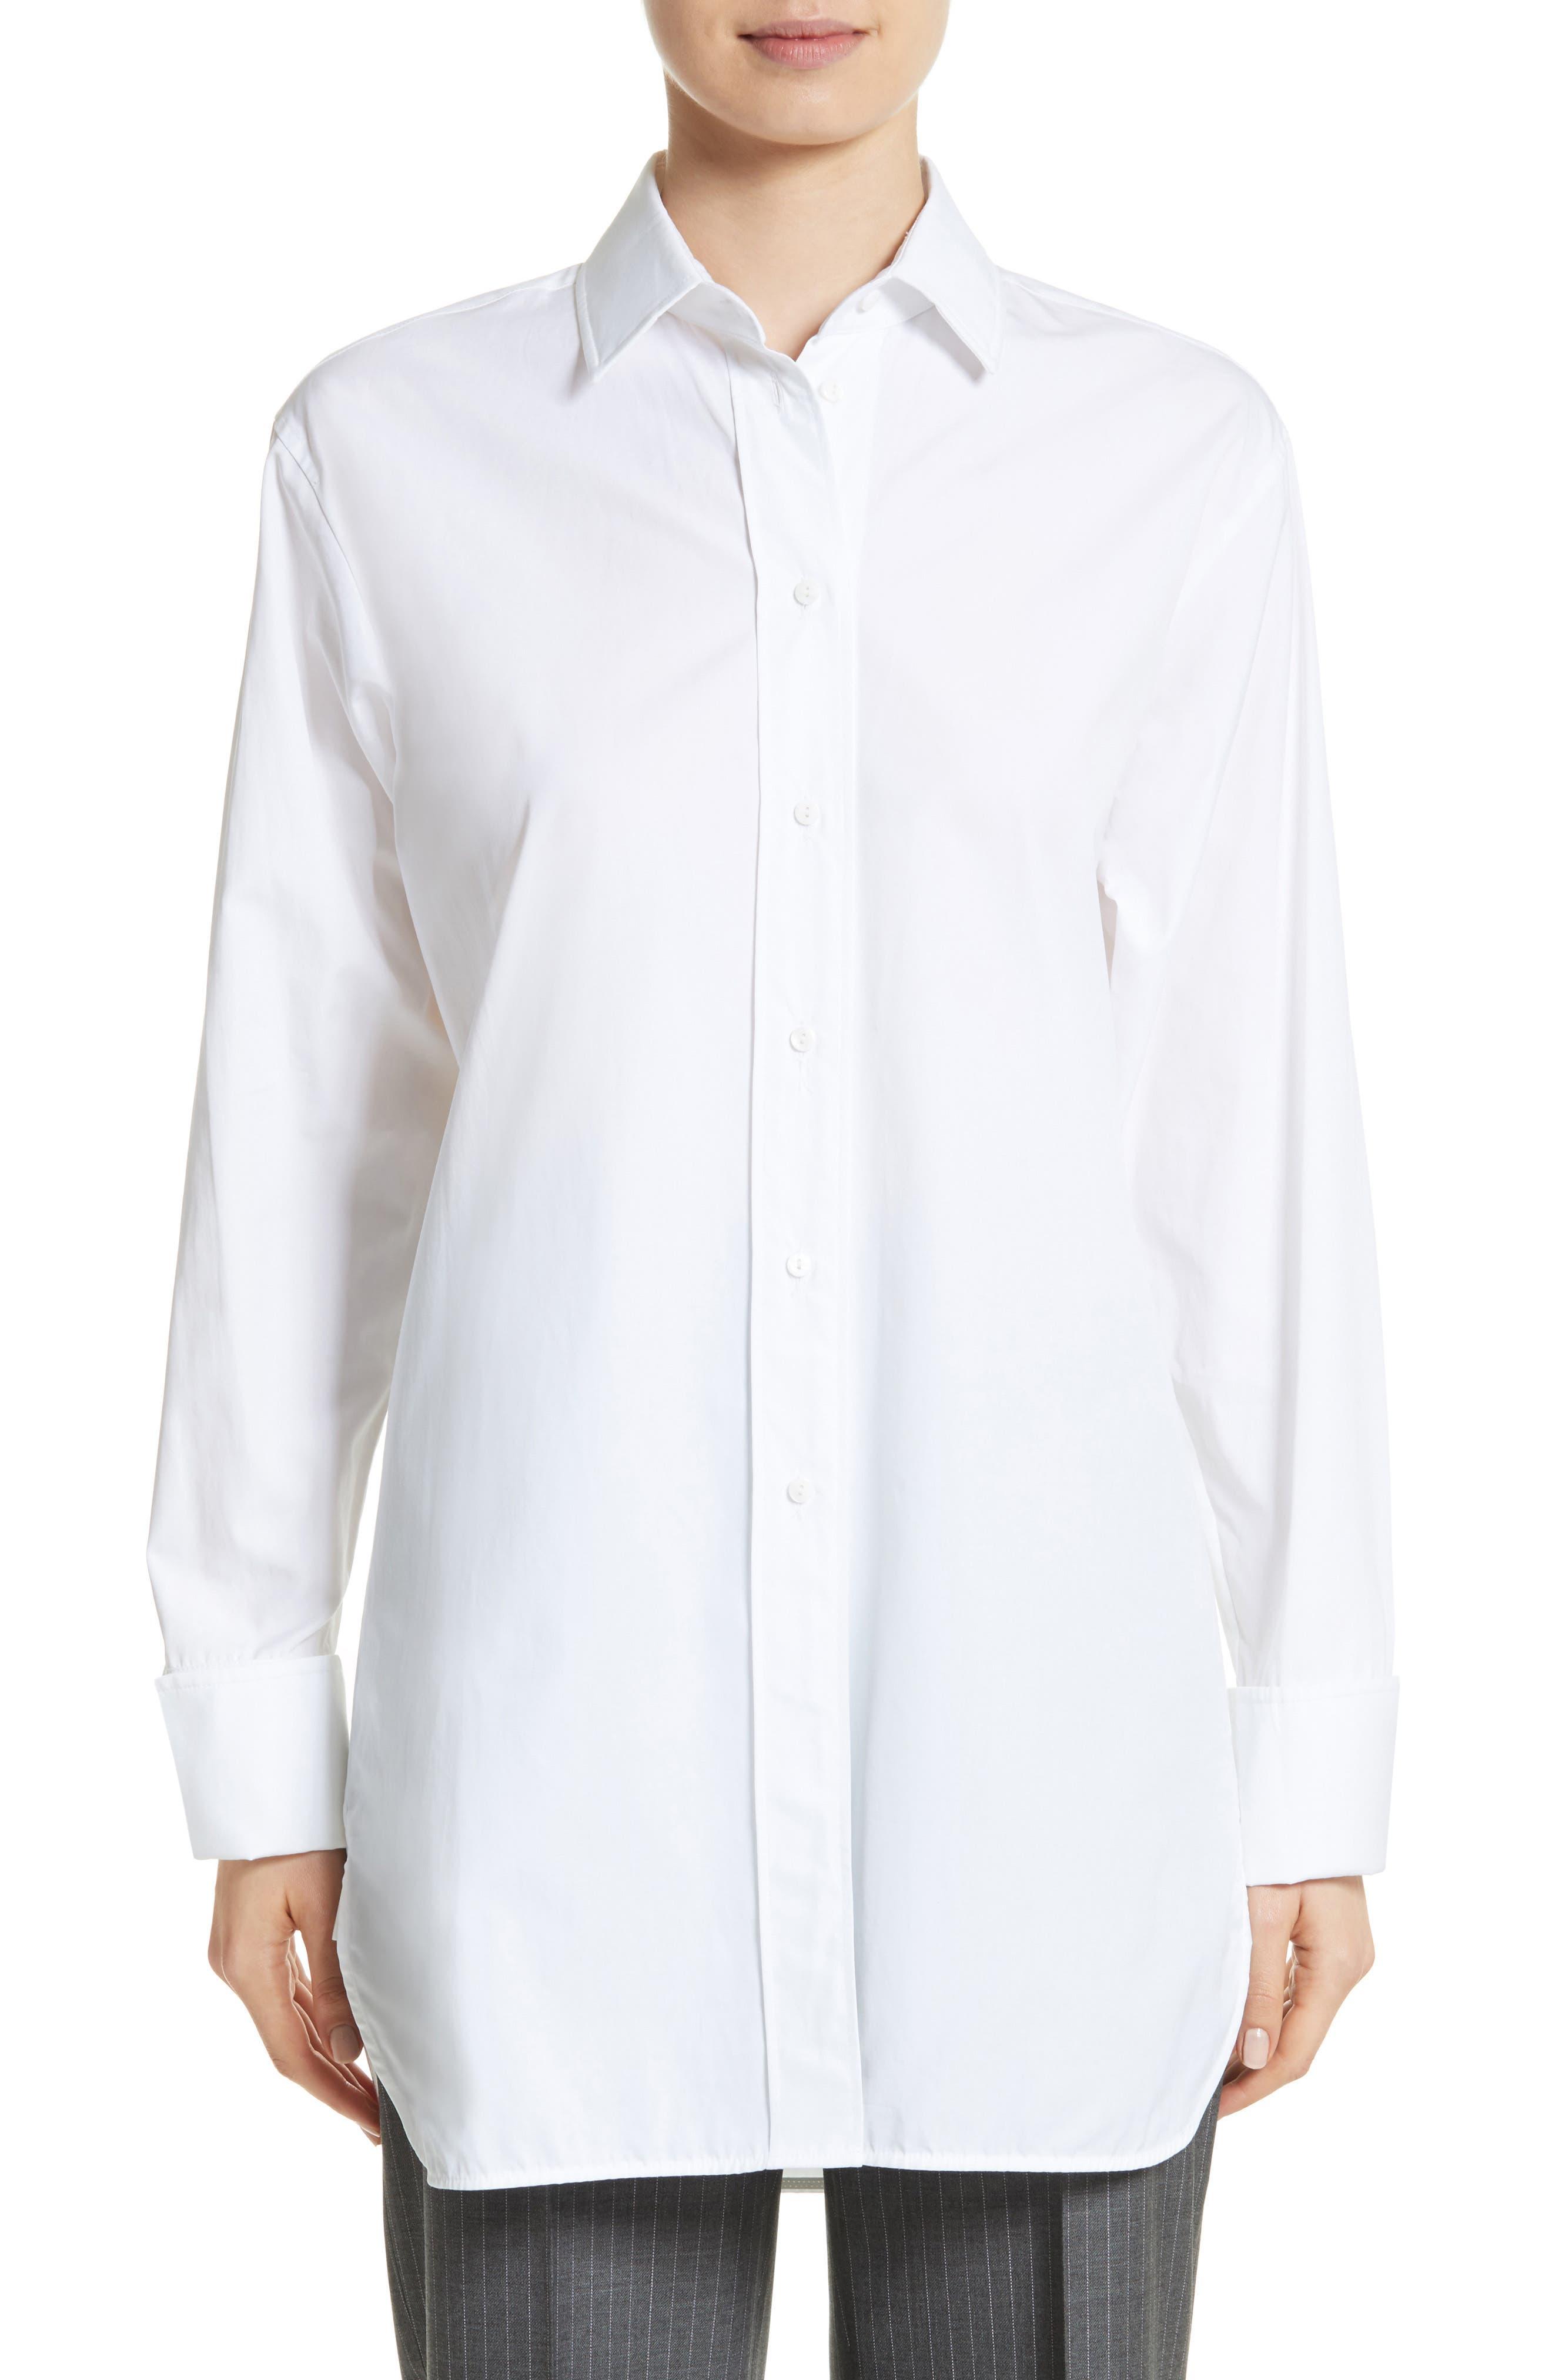 Alternate Image 1 Selected - Max Mara Visivo Cotton Poplin Shirt